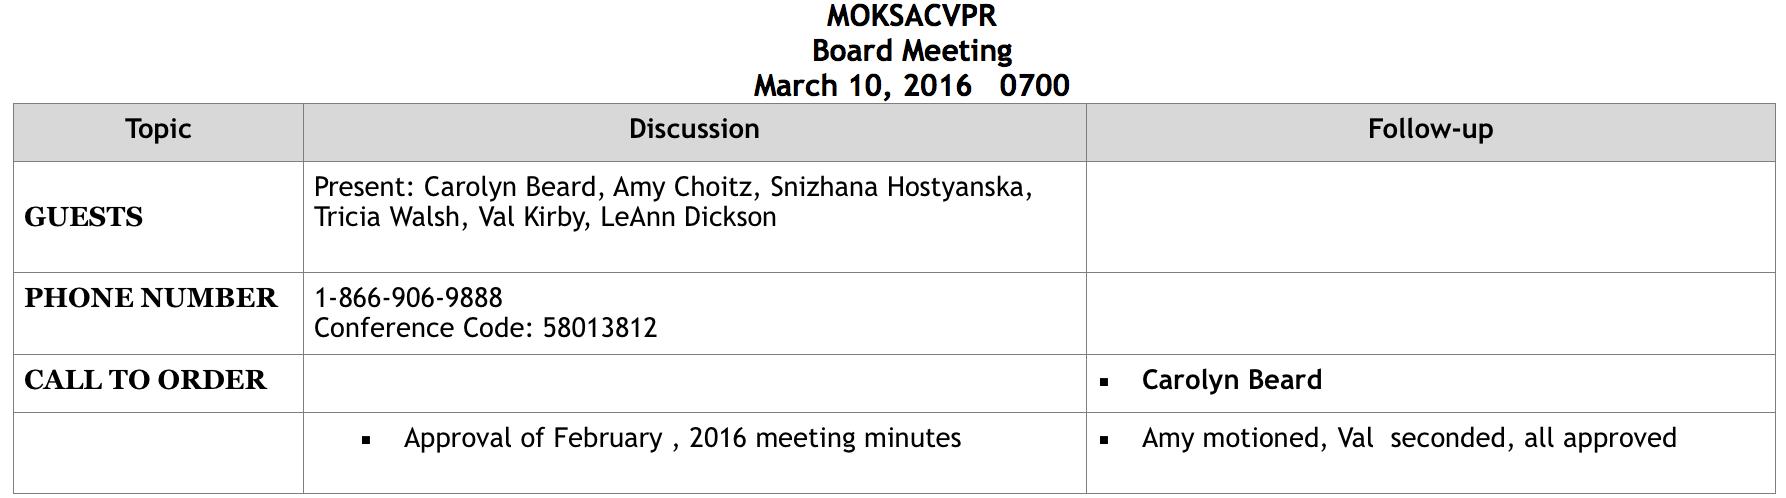 3-10-16-board-meeting-1